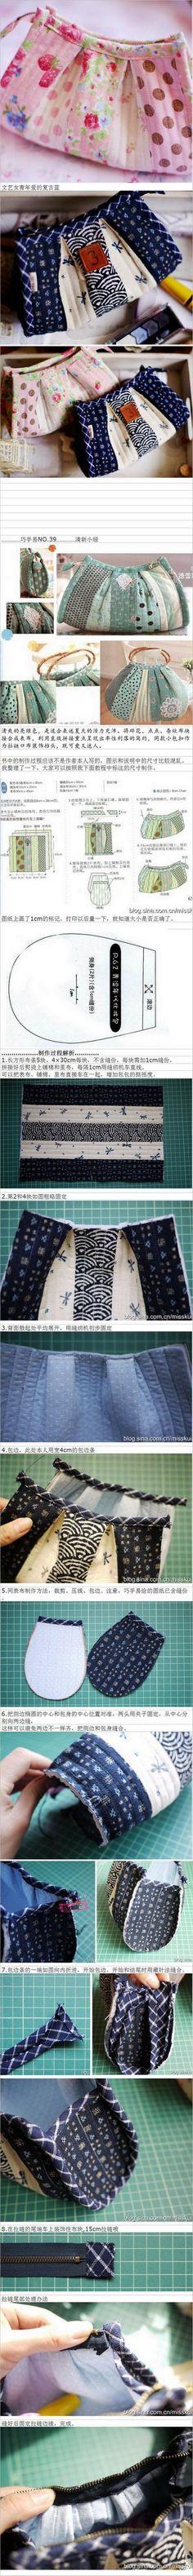 Patchwork Cosmetics Bag Tutorial